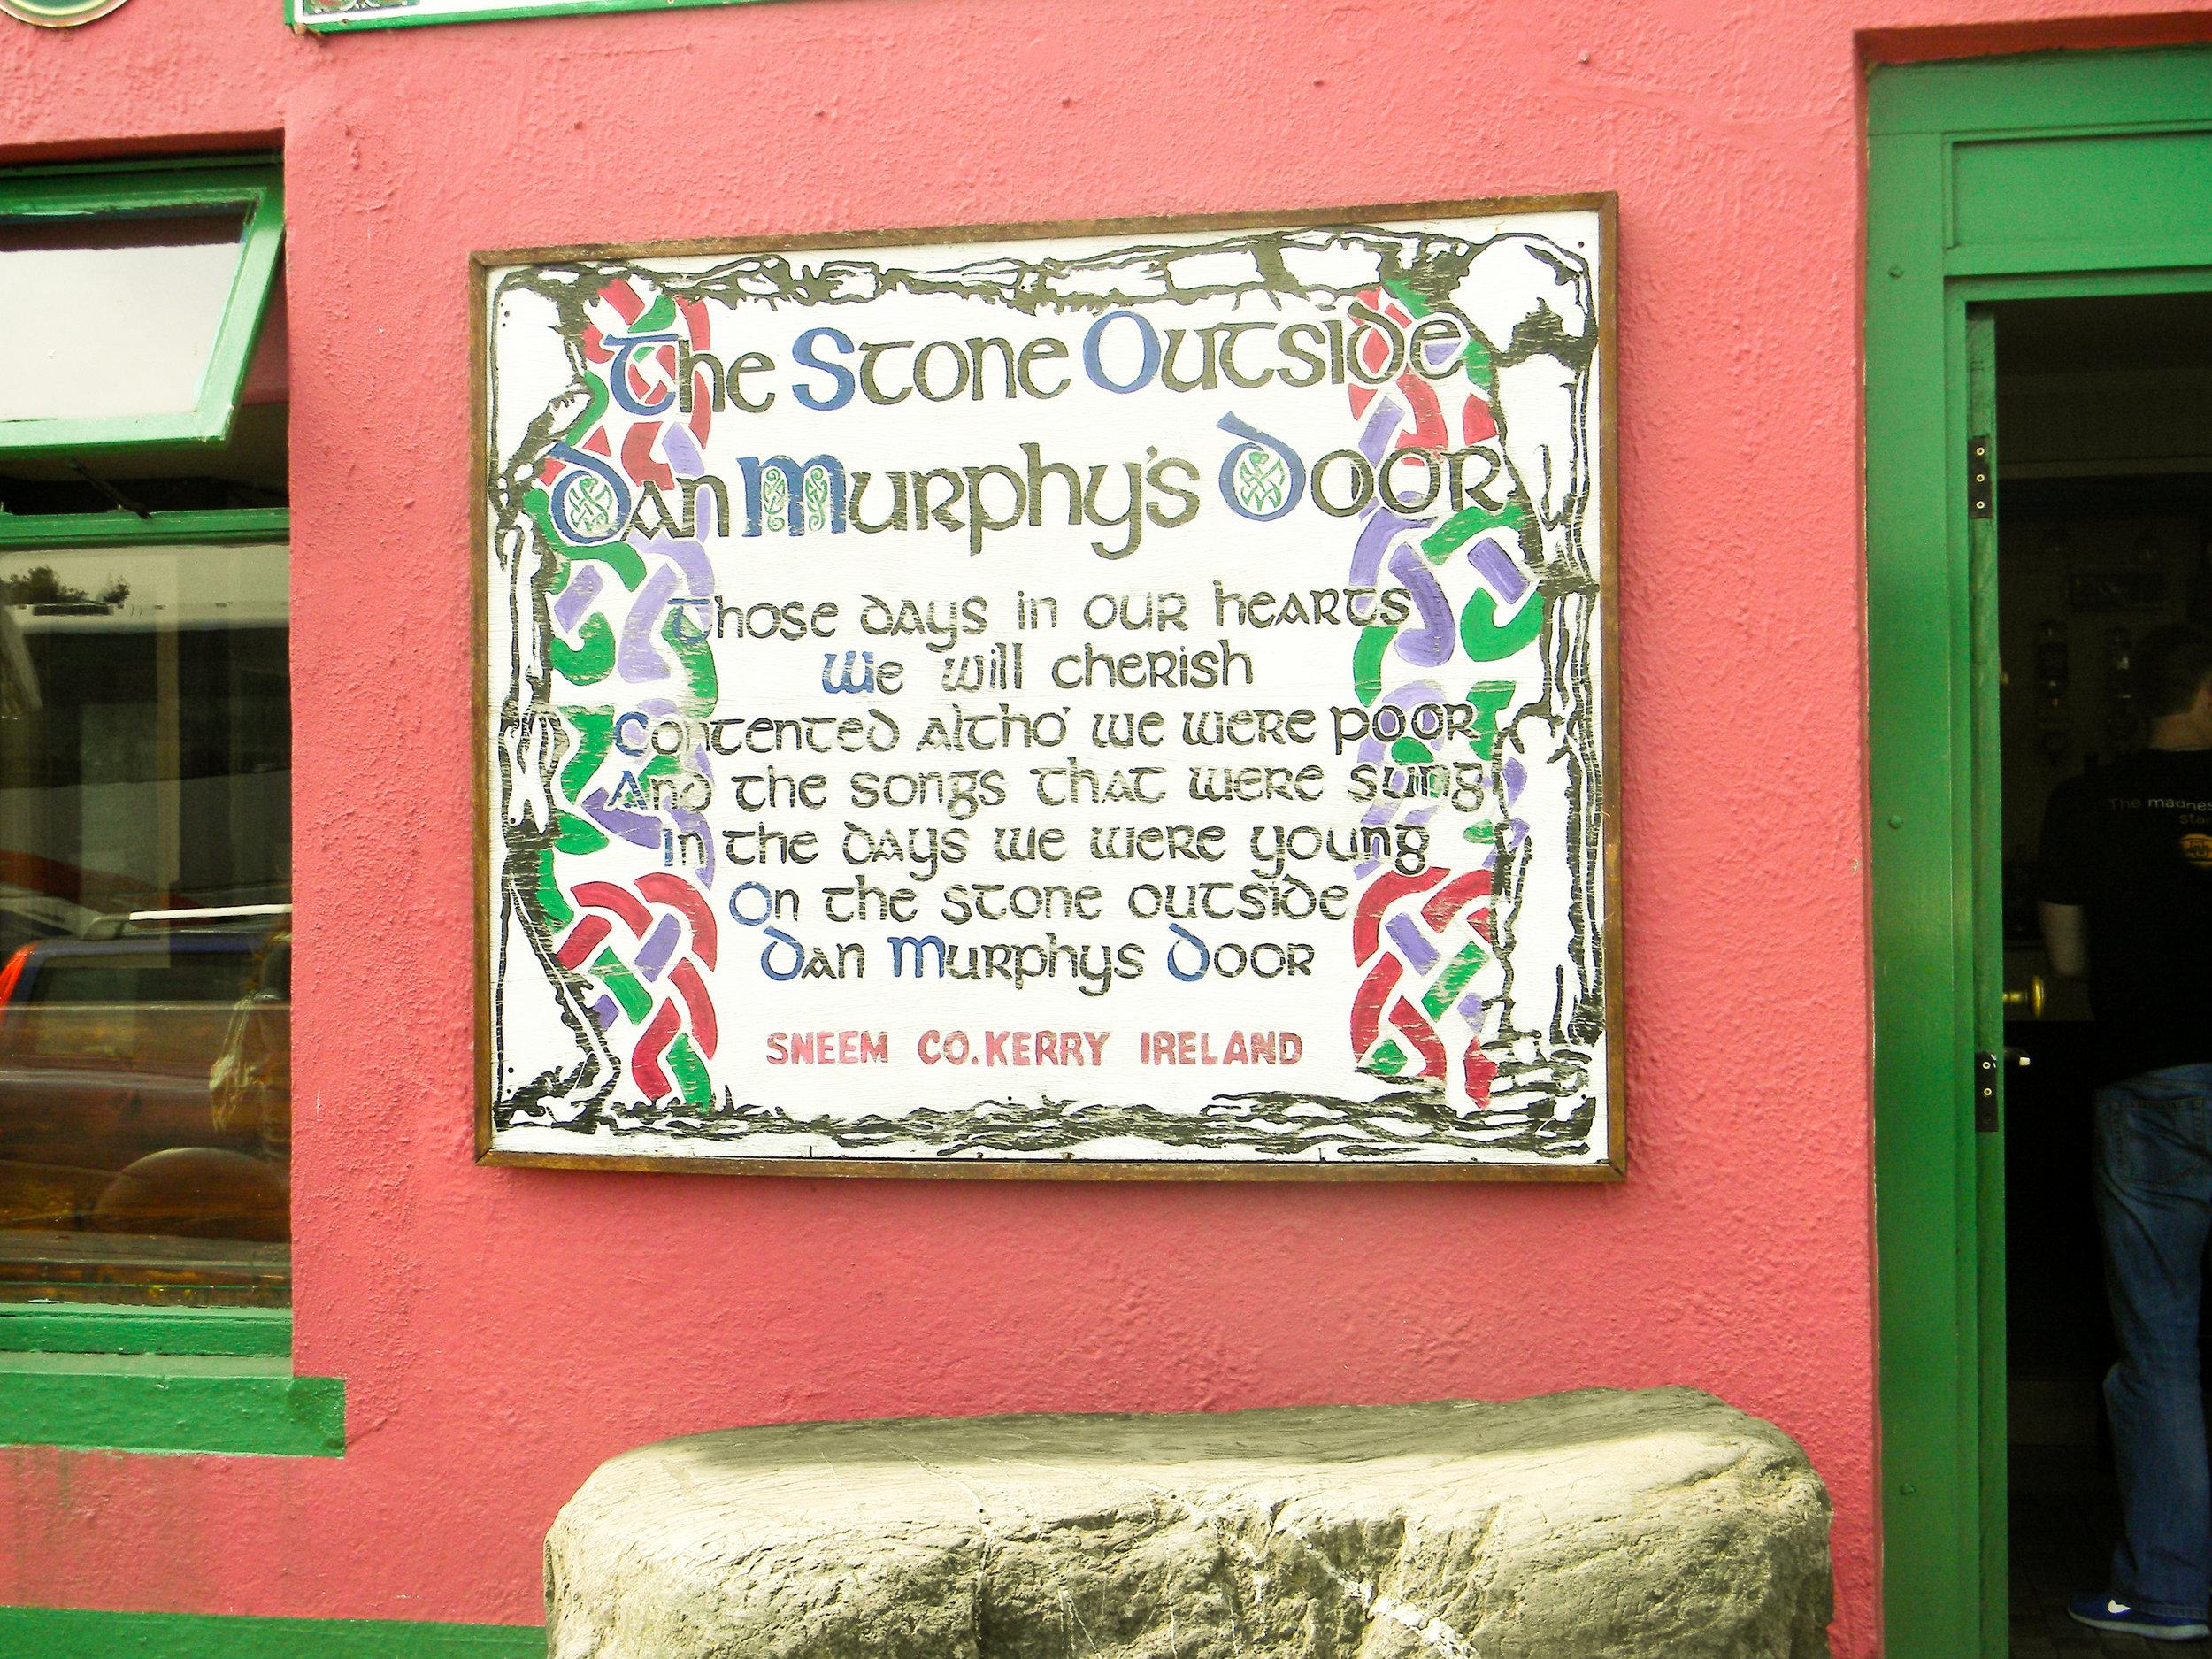 The Stone Outside Dan Murphy's Door in Sneem, County Kerry, Ireland